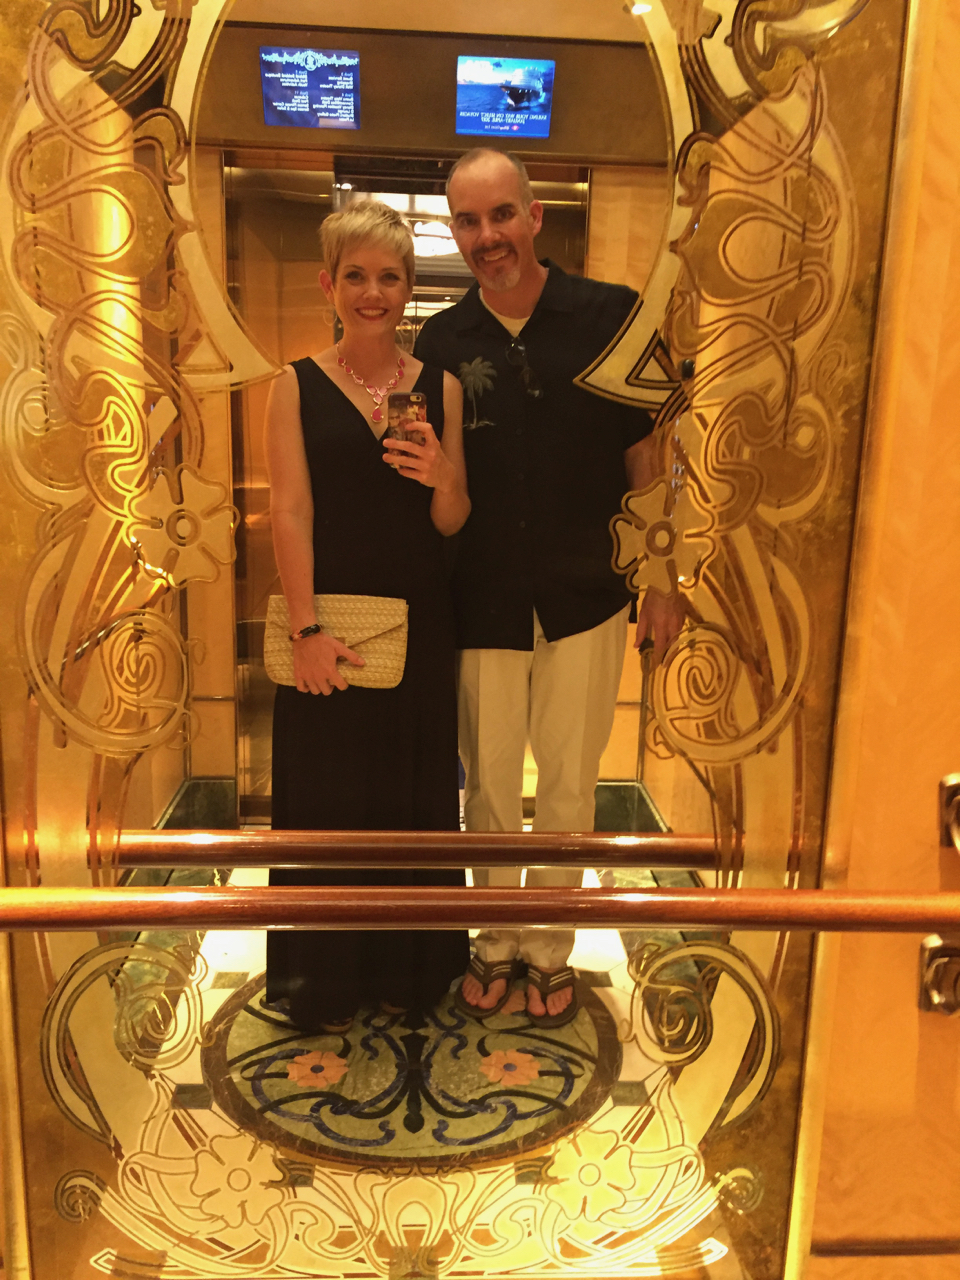 Disney Fantasy Cruise - Elevator Selfie